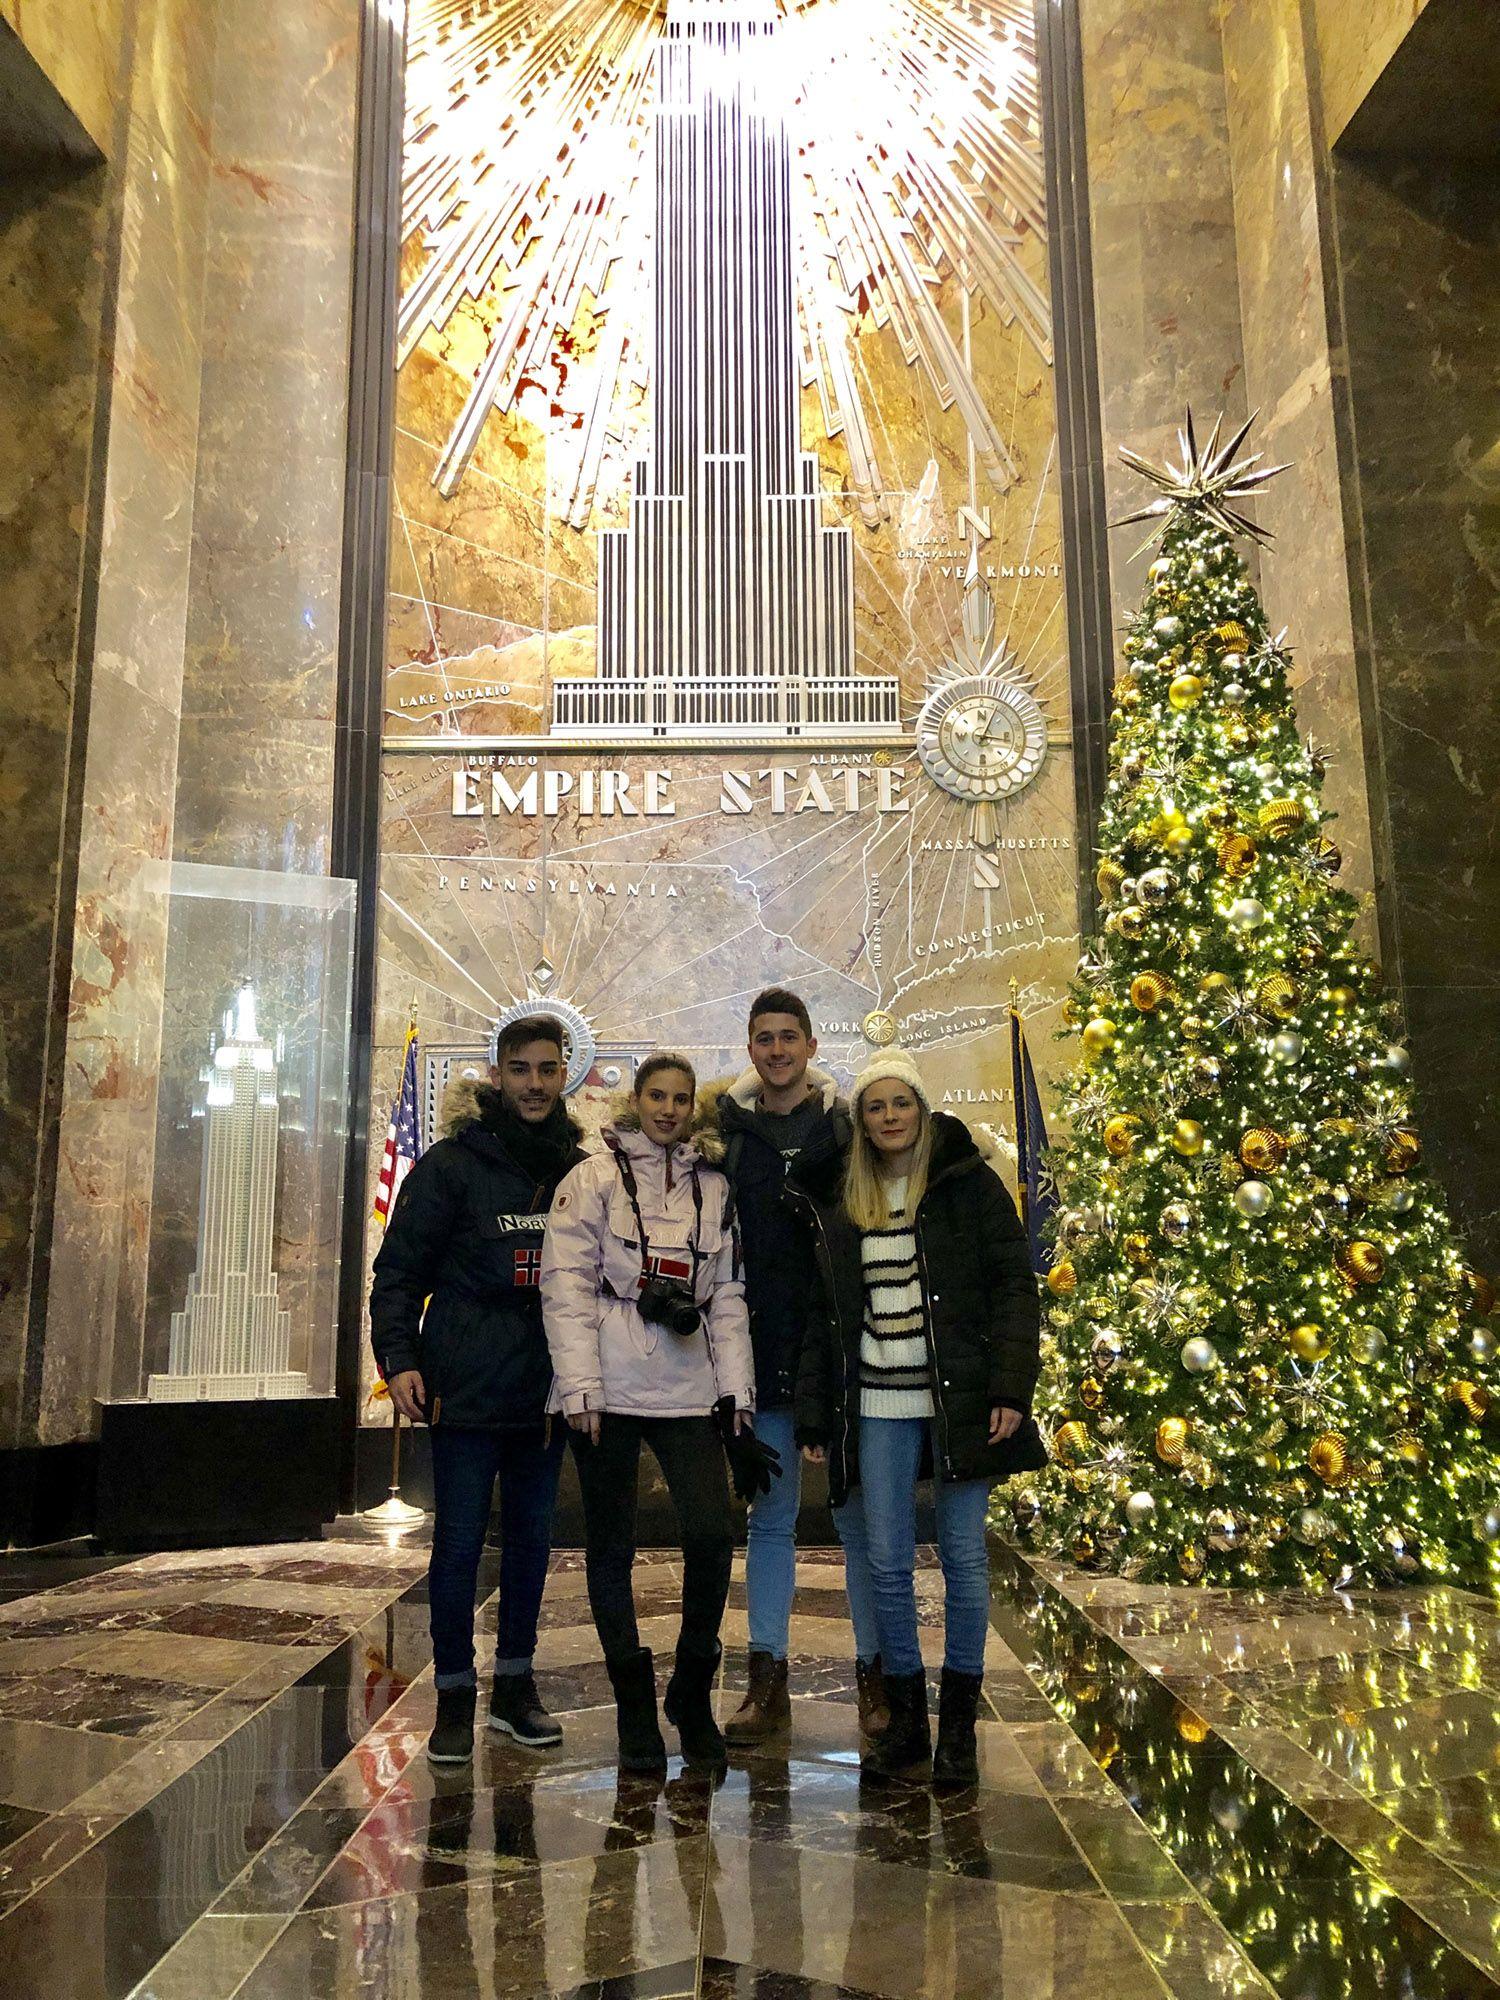 Empire State, Ruta andando por Manhattan (Nueva York)